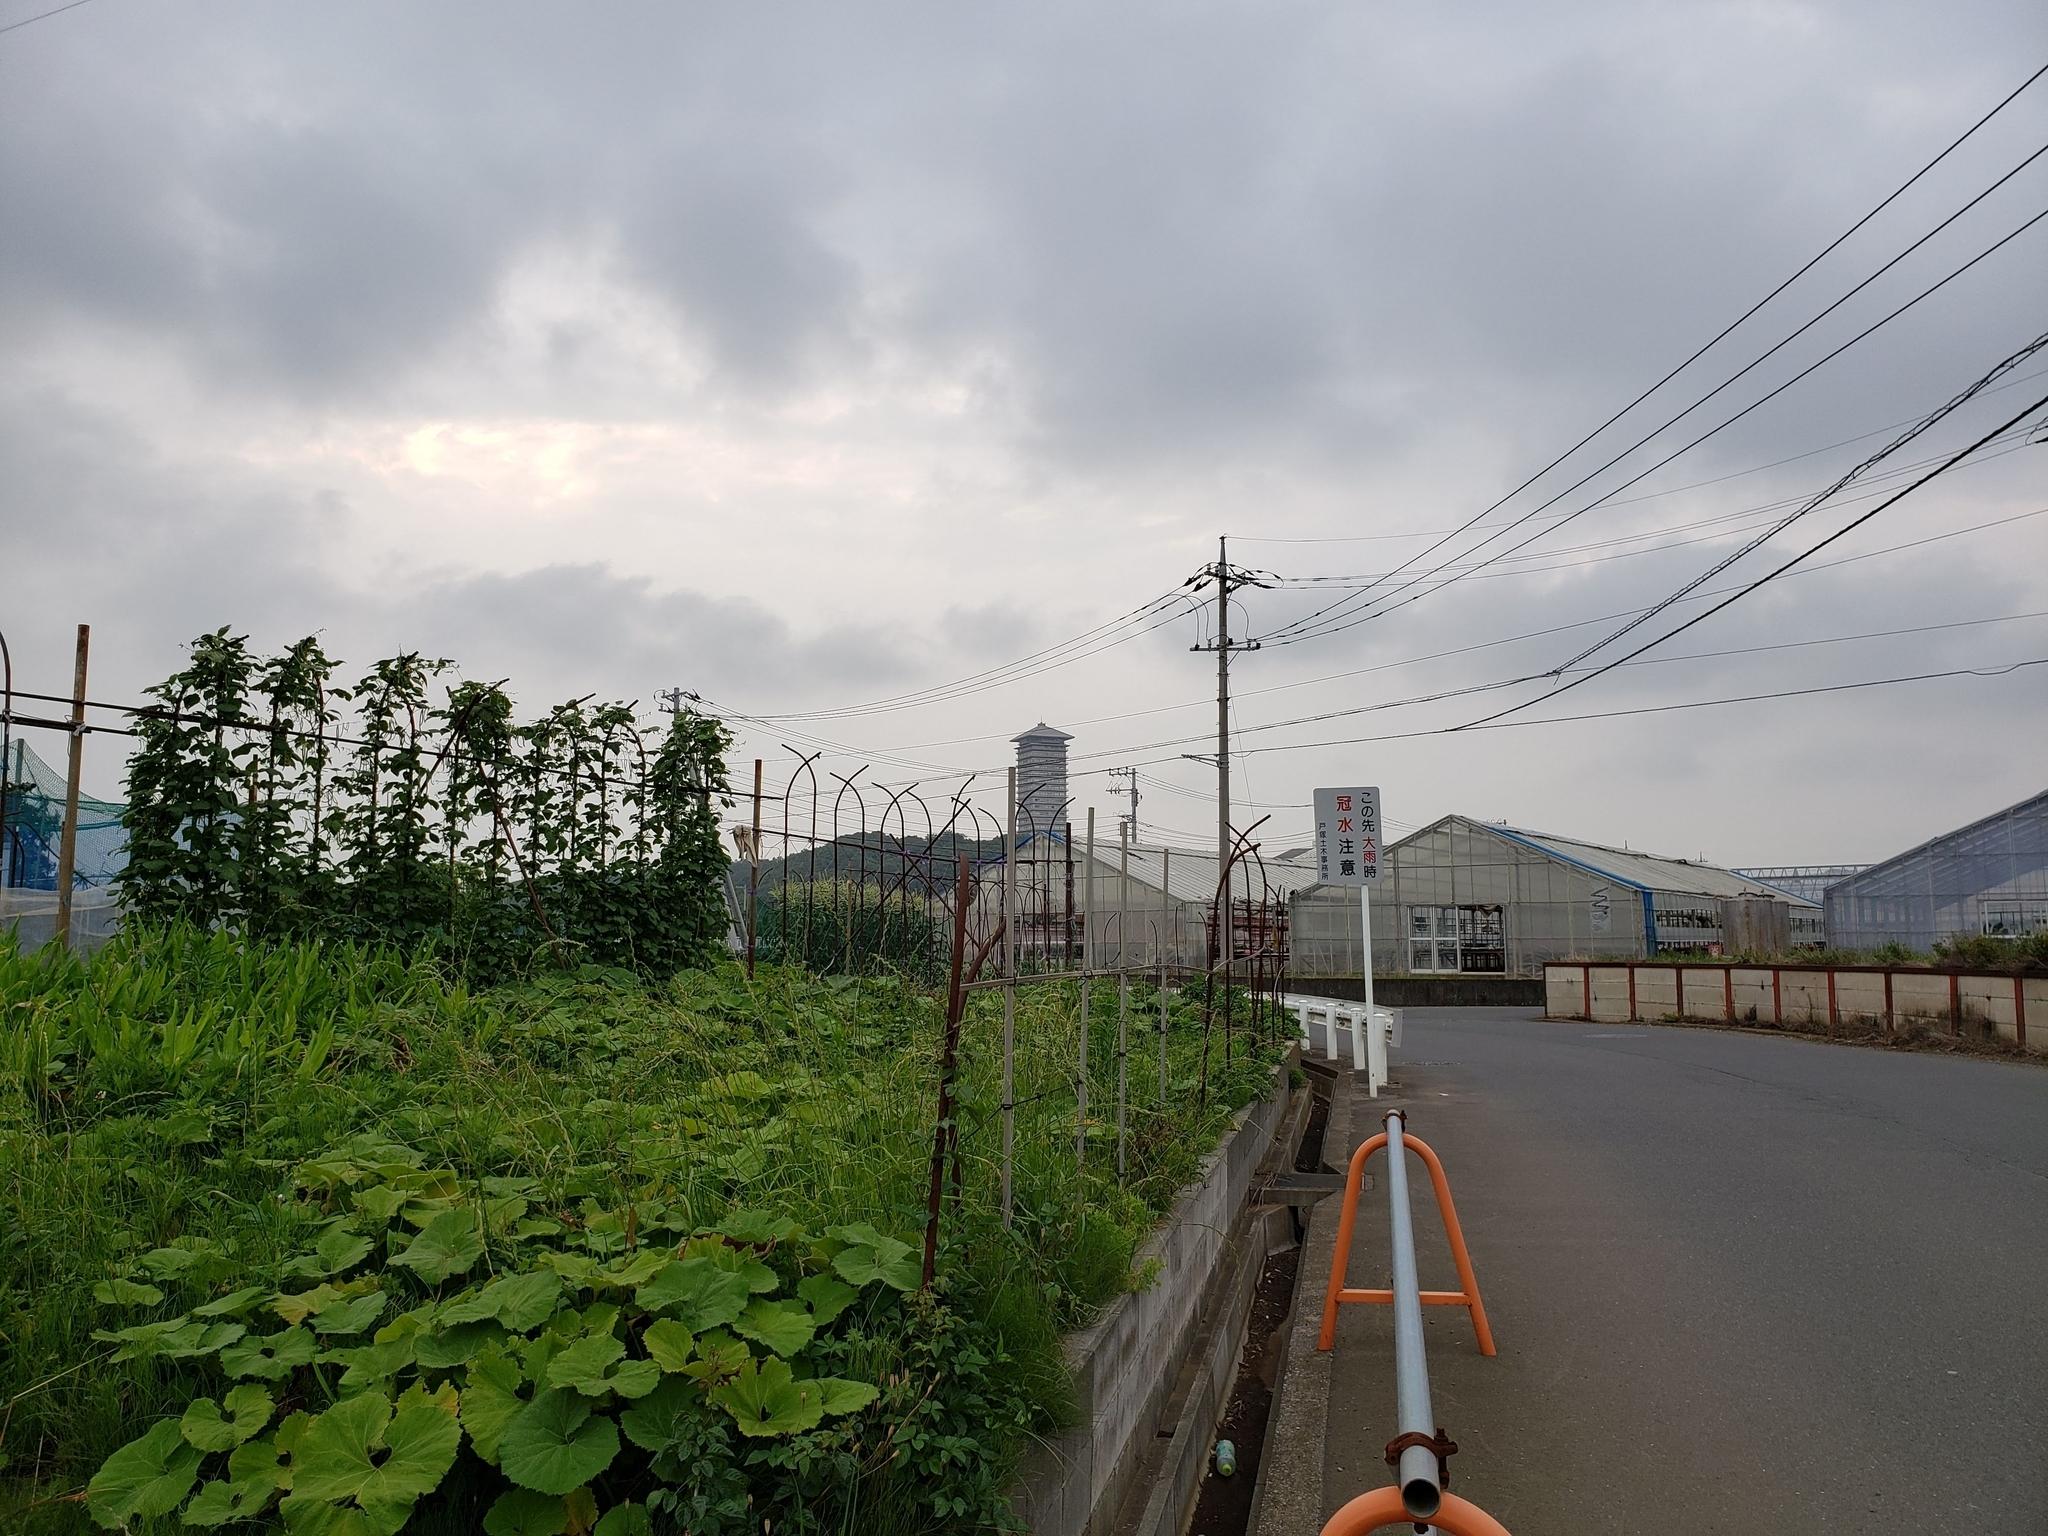 f:id:ToshUeno:20190608173912j:plain